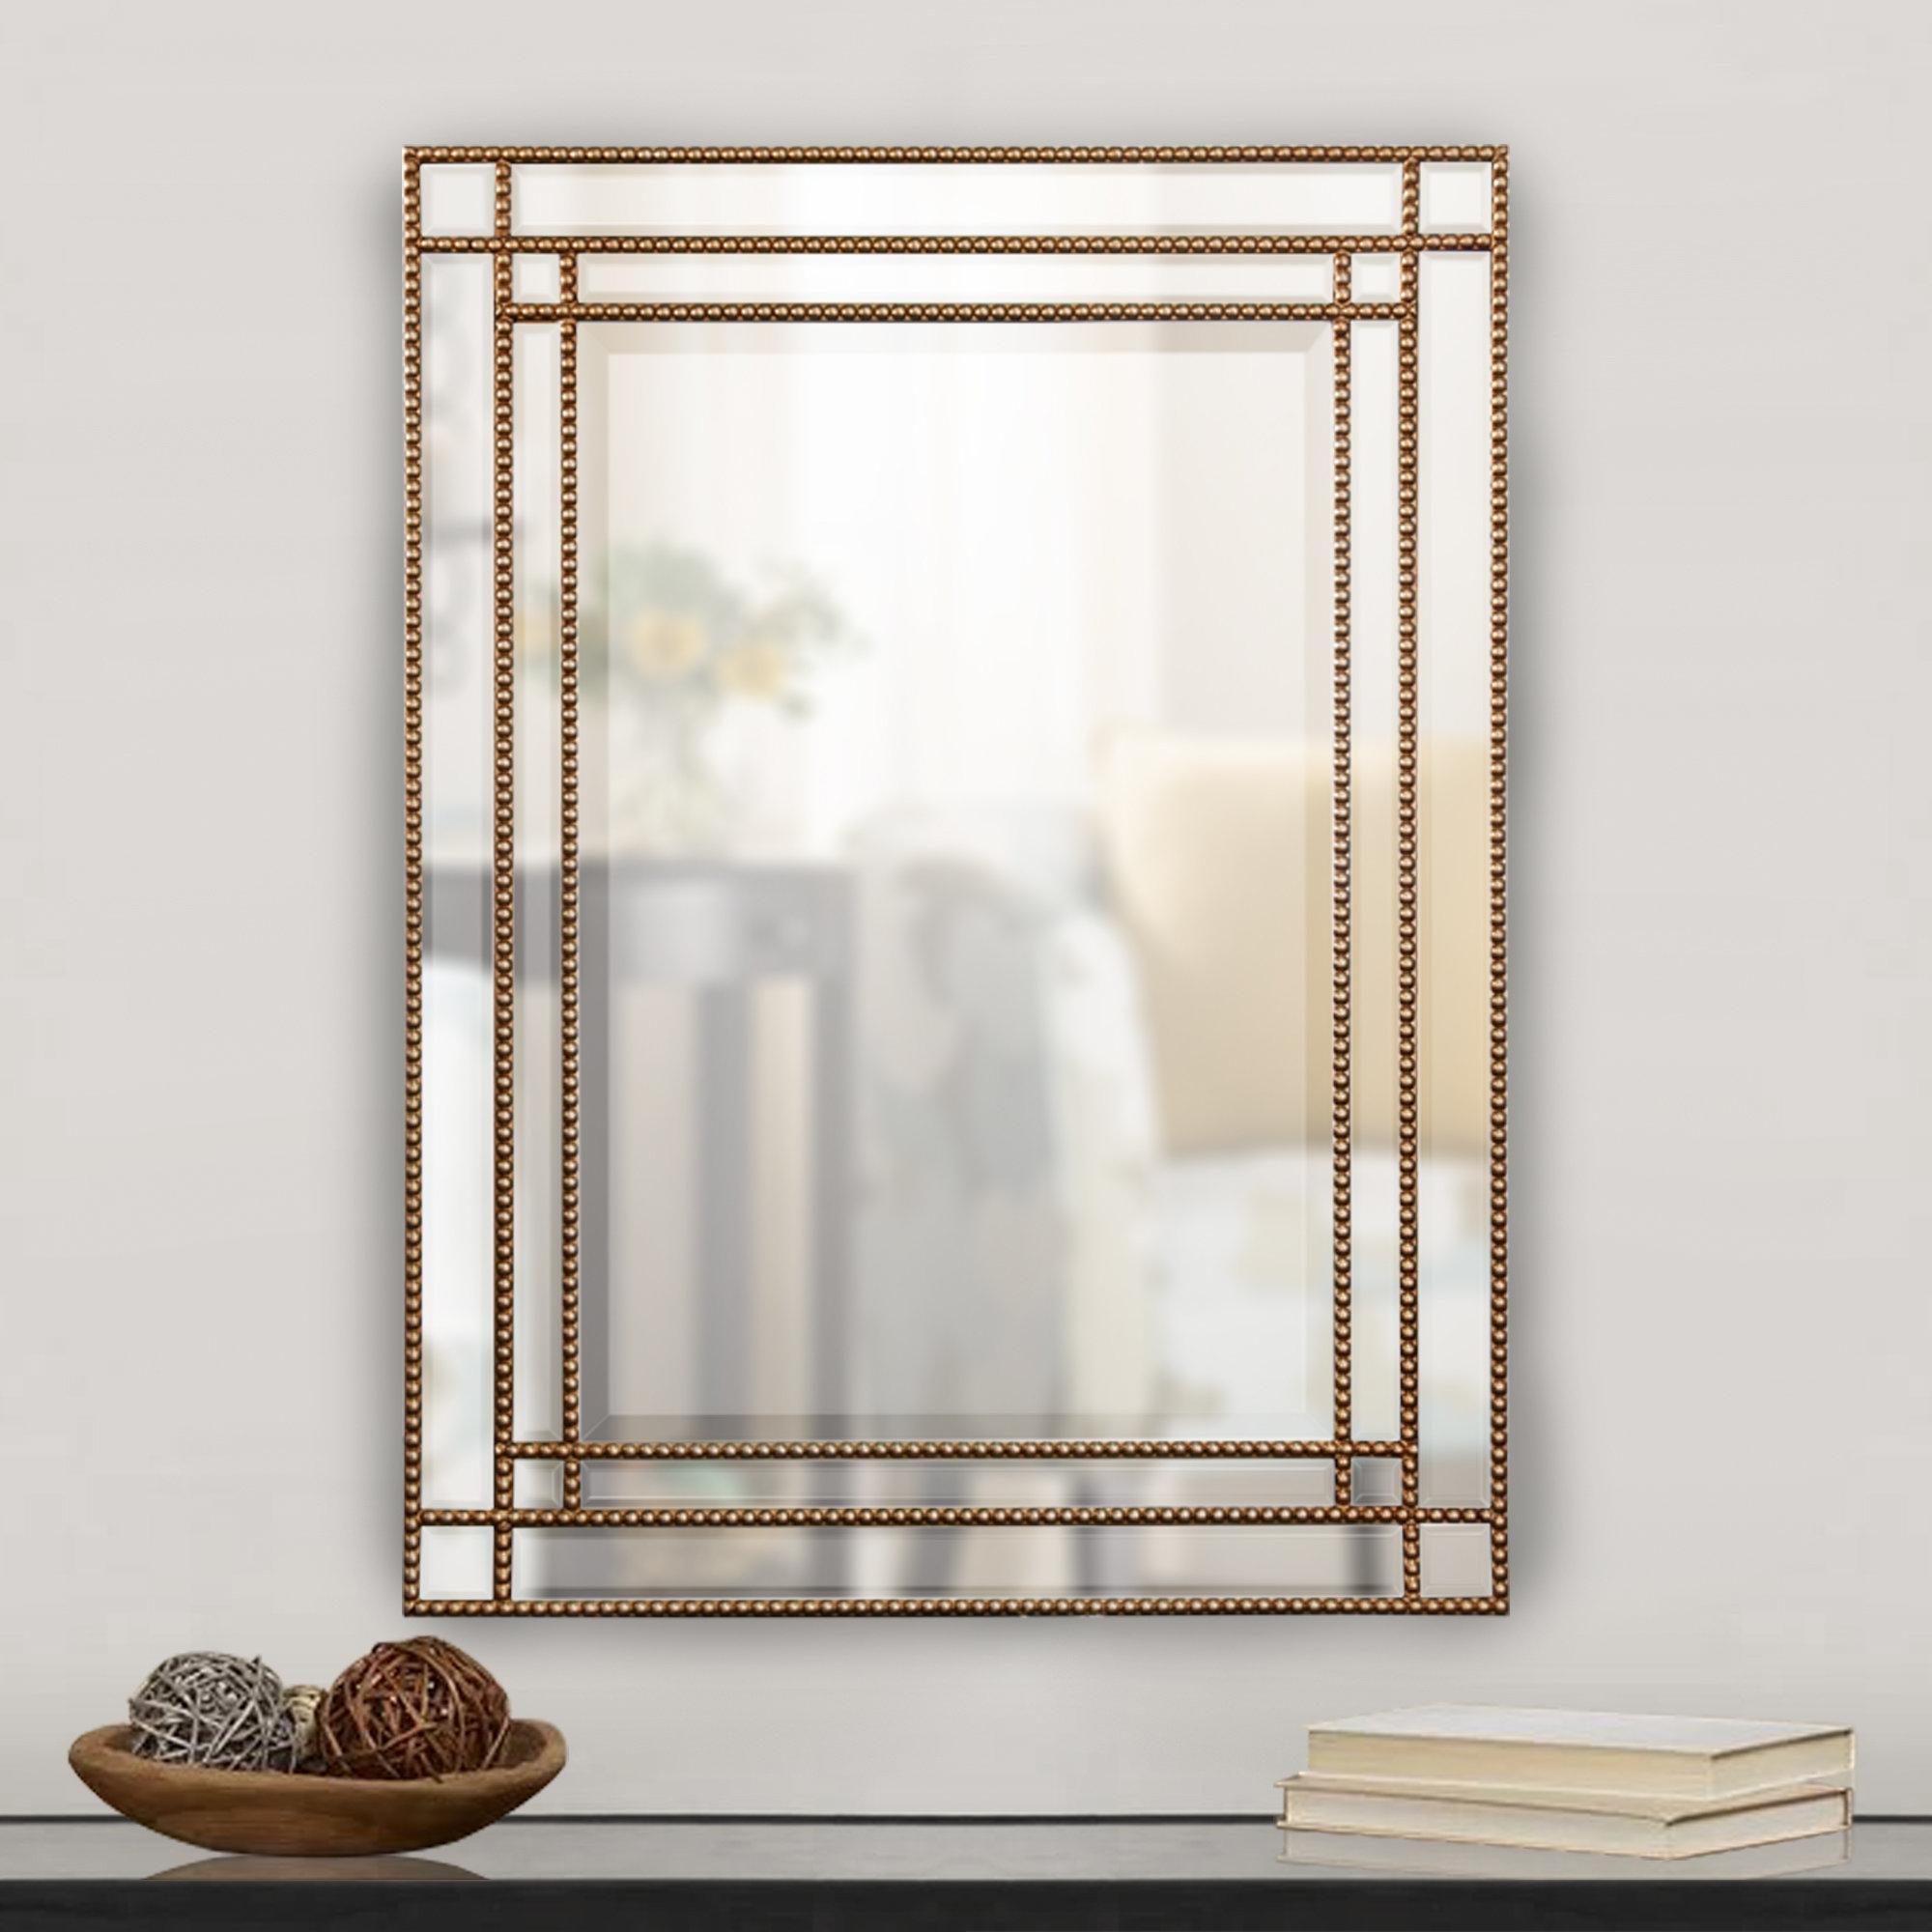 Beveled Beaded Mirror | Wayfair Regarding Vassallo Beaded Bronze Beveled Wall Mirrors (Image 3 of 20)